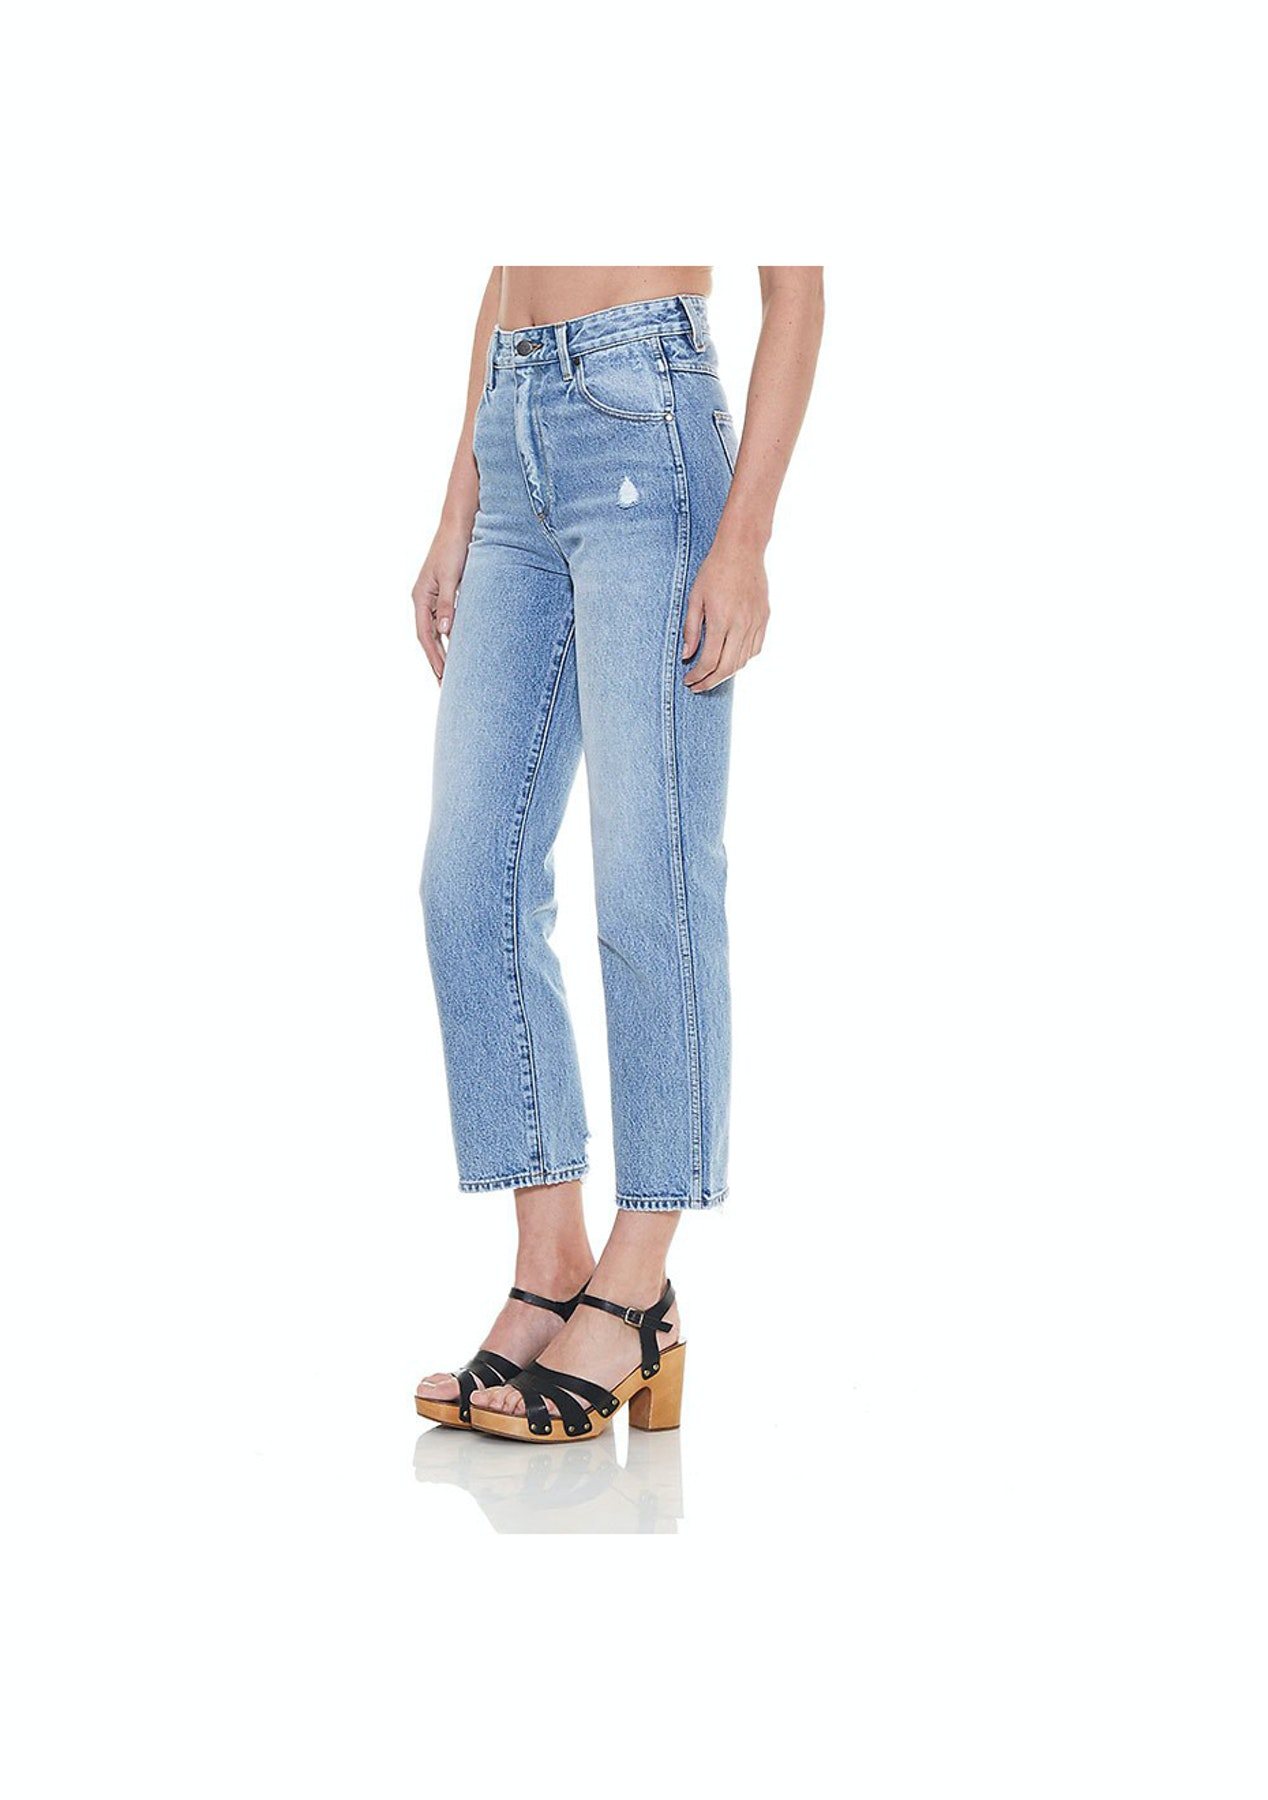 7430d2ac1b Wrangler - Womens - Hi Birkin Jean - Strip Vintage - Only 1 Left - Onceit